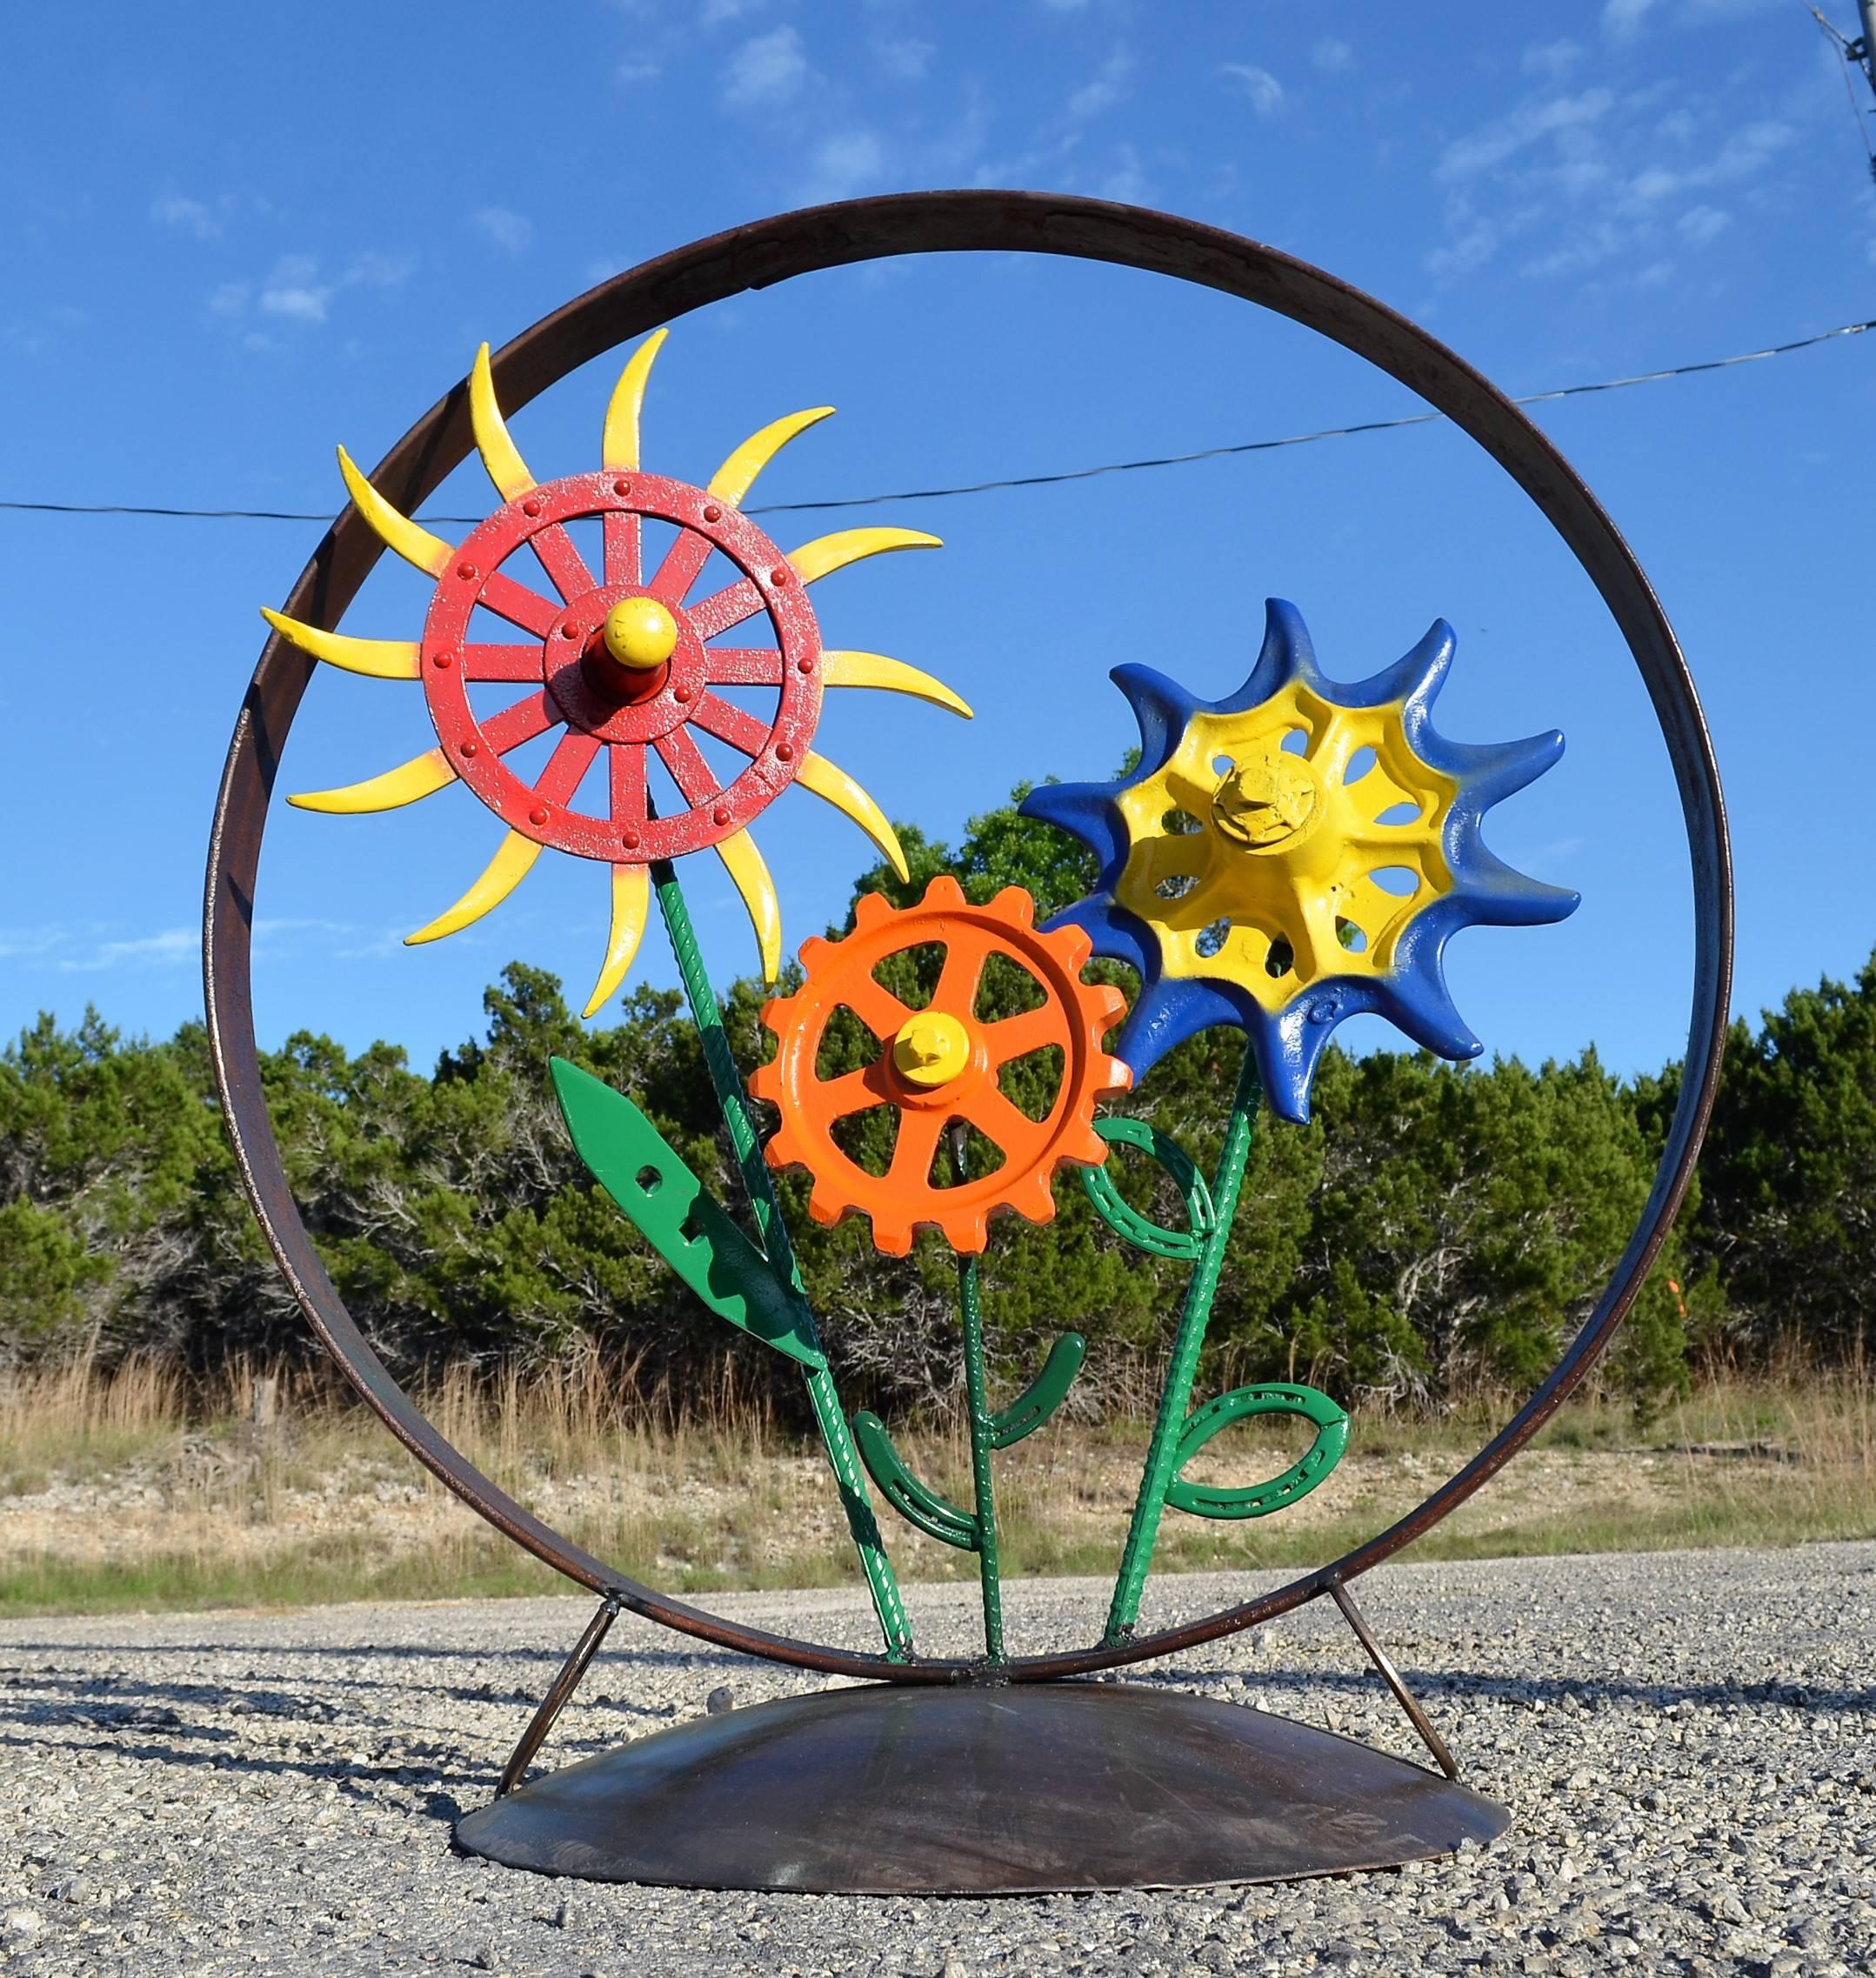 Yard Art – Sycamore Creek Creations Regarding Newest Metal Sunflower Yard Art (Gallery 24 of 26)